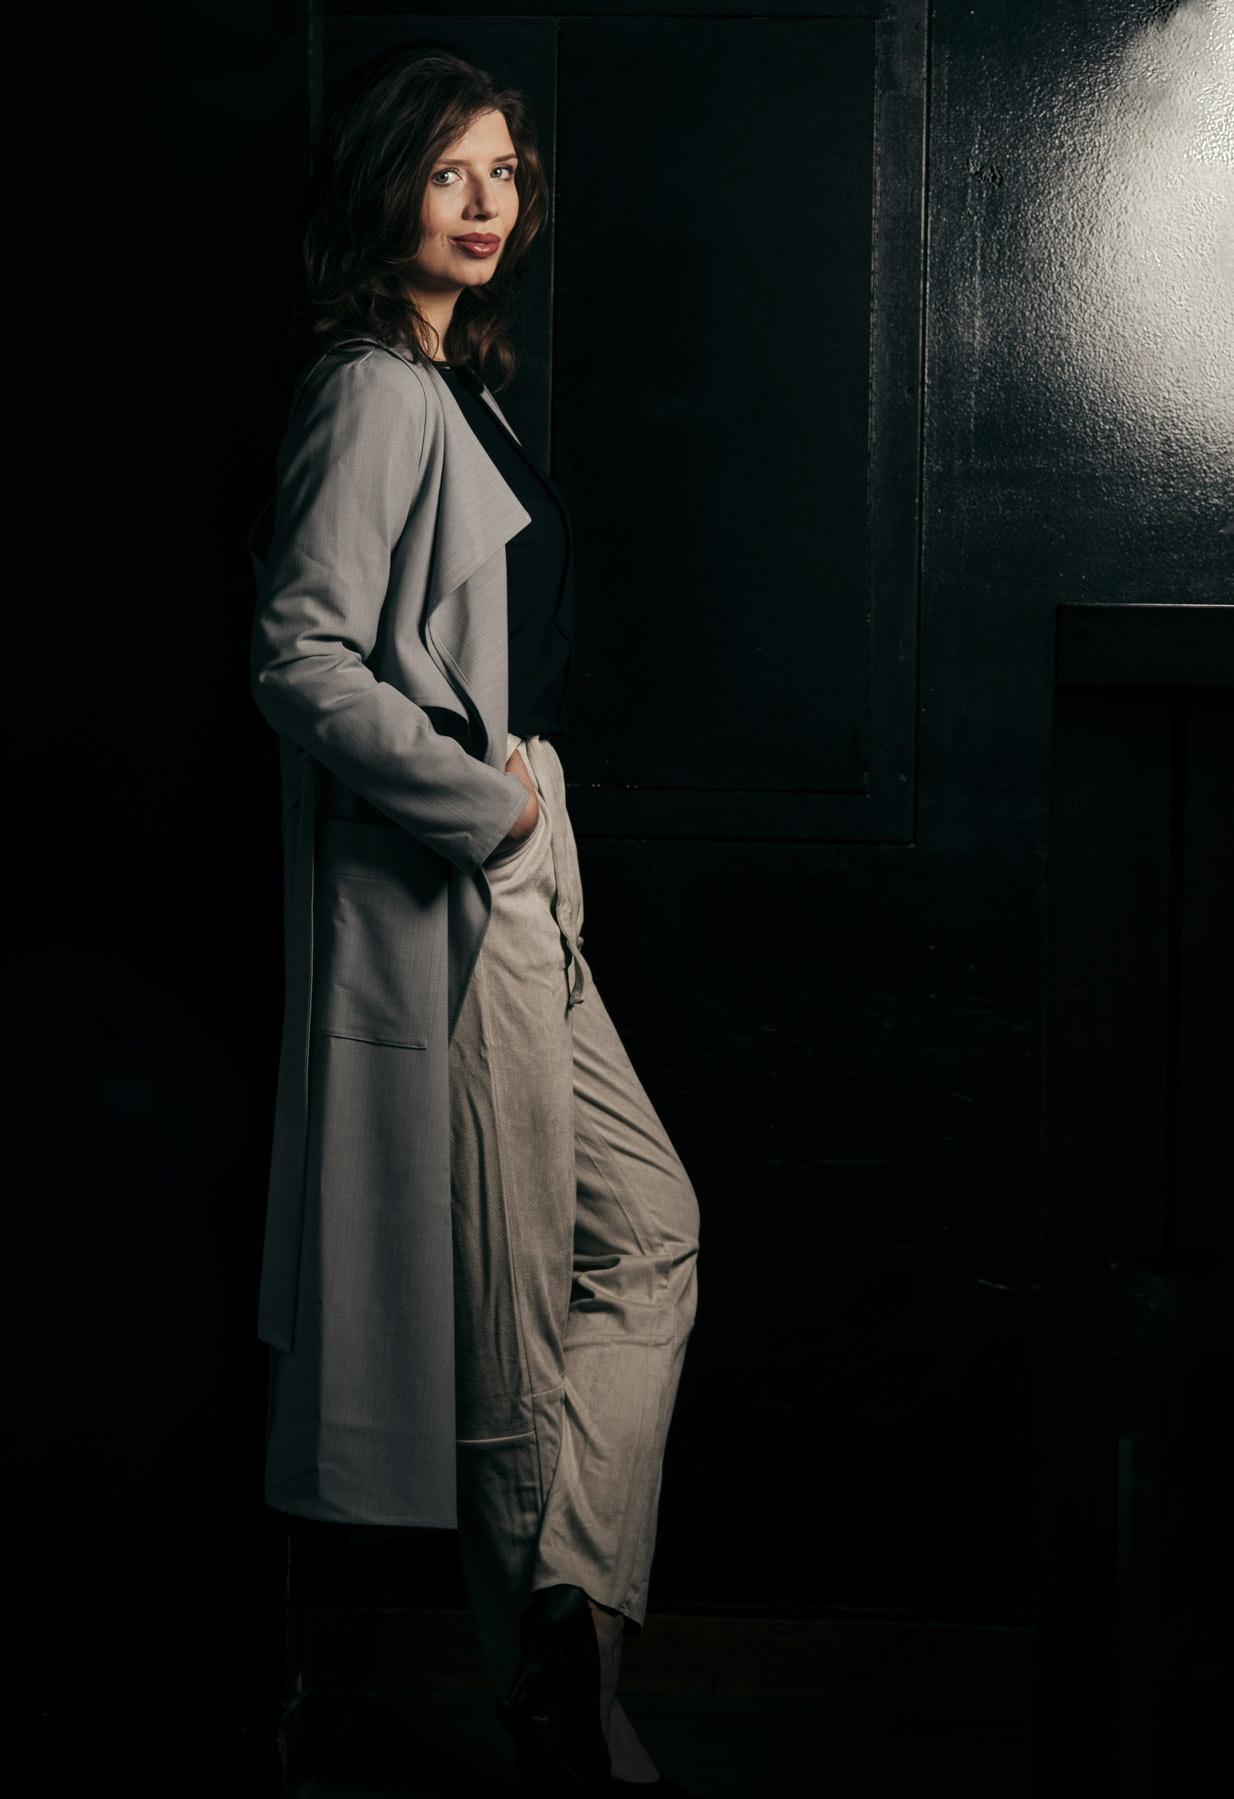 Kristina_Kufner_Portrait_März19-5